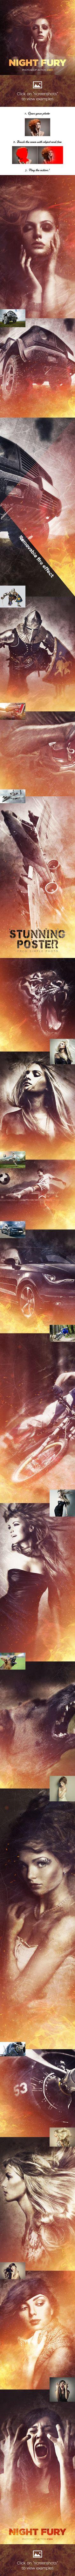 Night Fury Photoshop Action CS3+. Download here: http://graphicriver.net/item/night-fury-photoshop-action-cs3/16074494?ref=ksioks